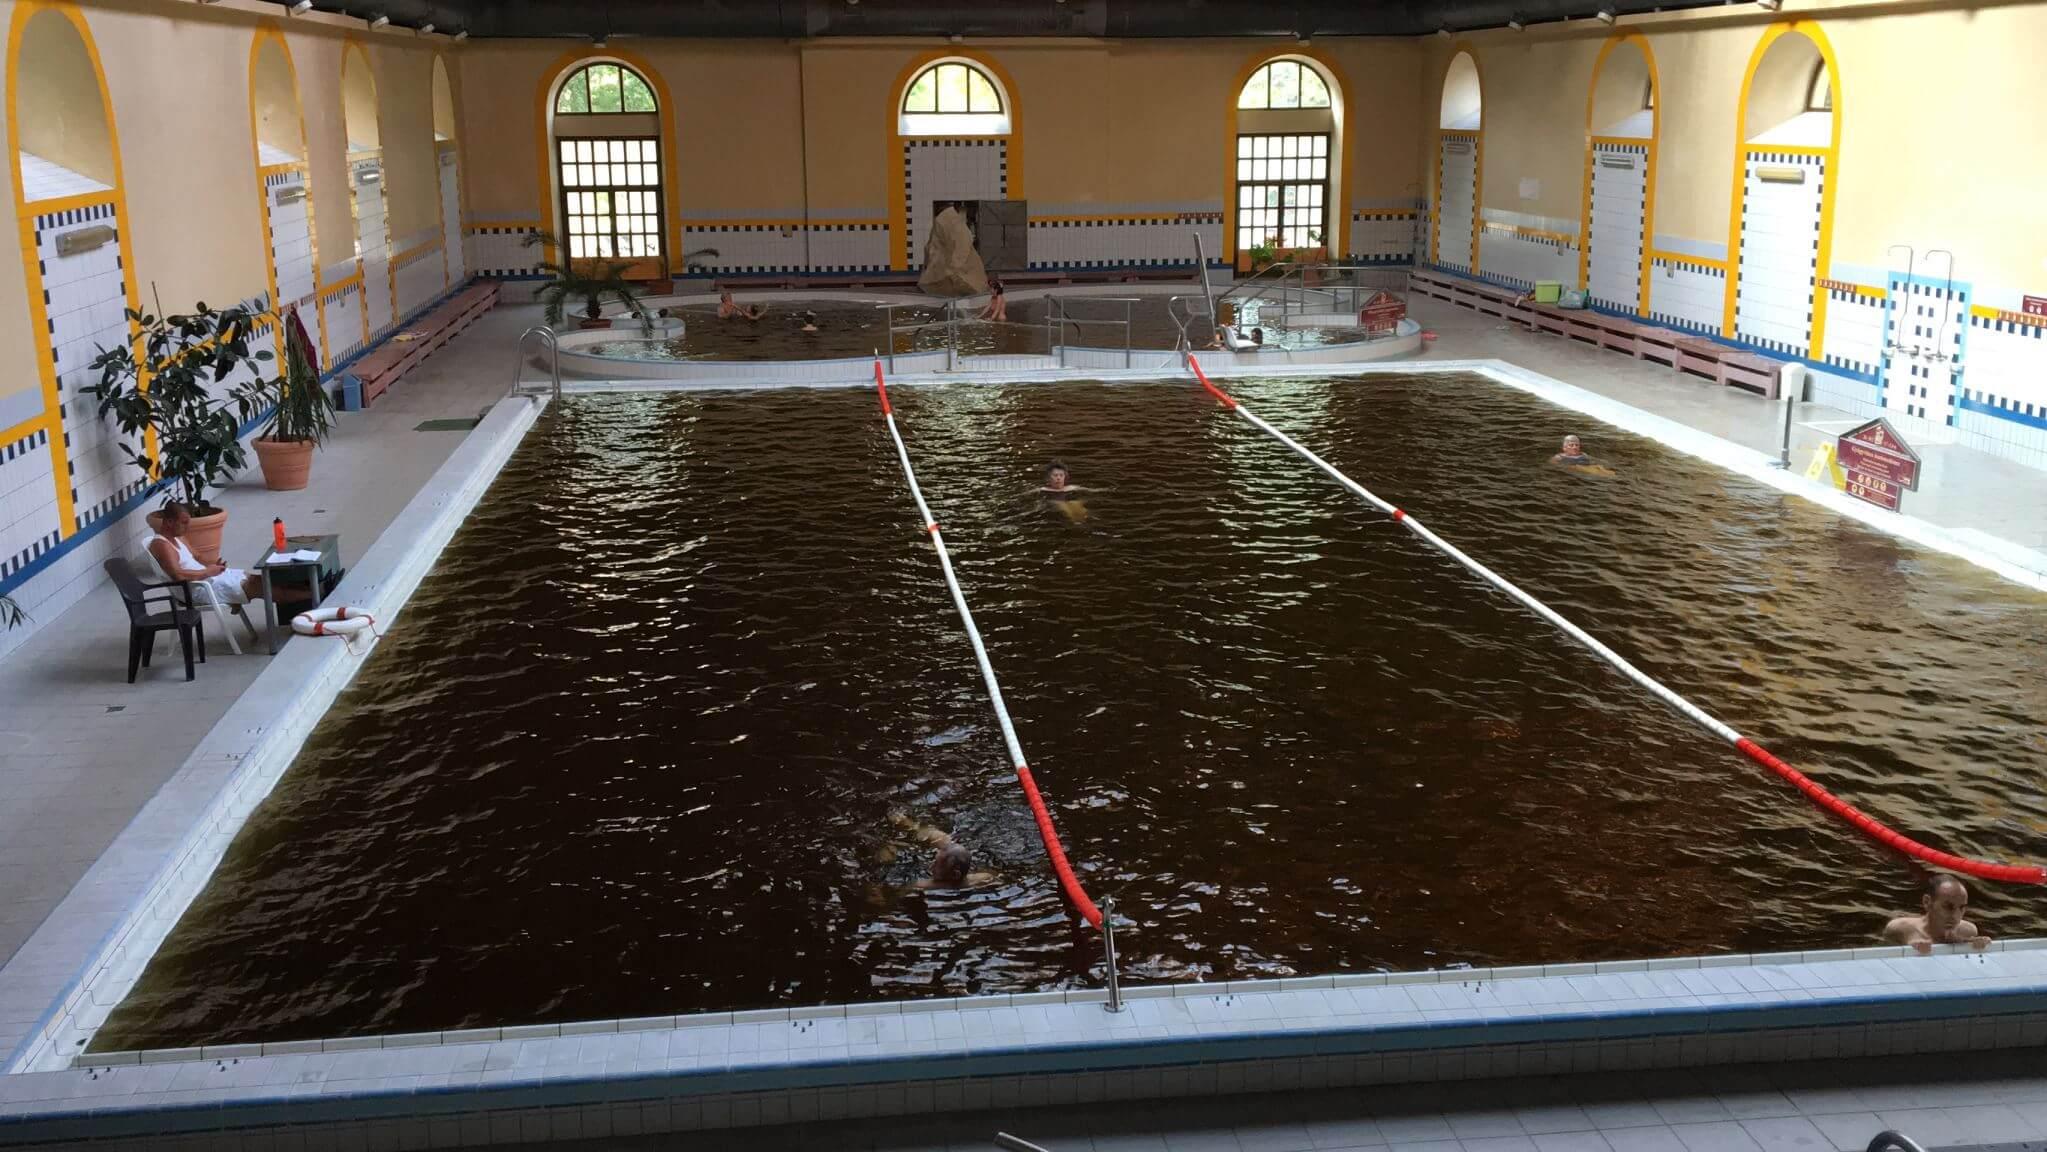 Hot Water Spa in Gyula, Hungary